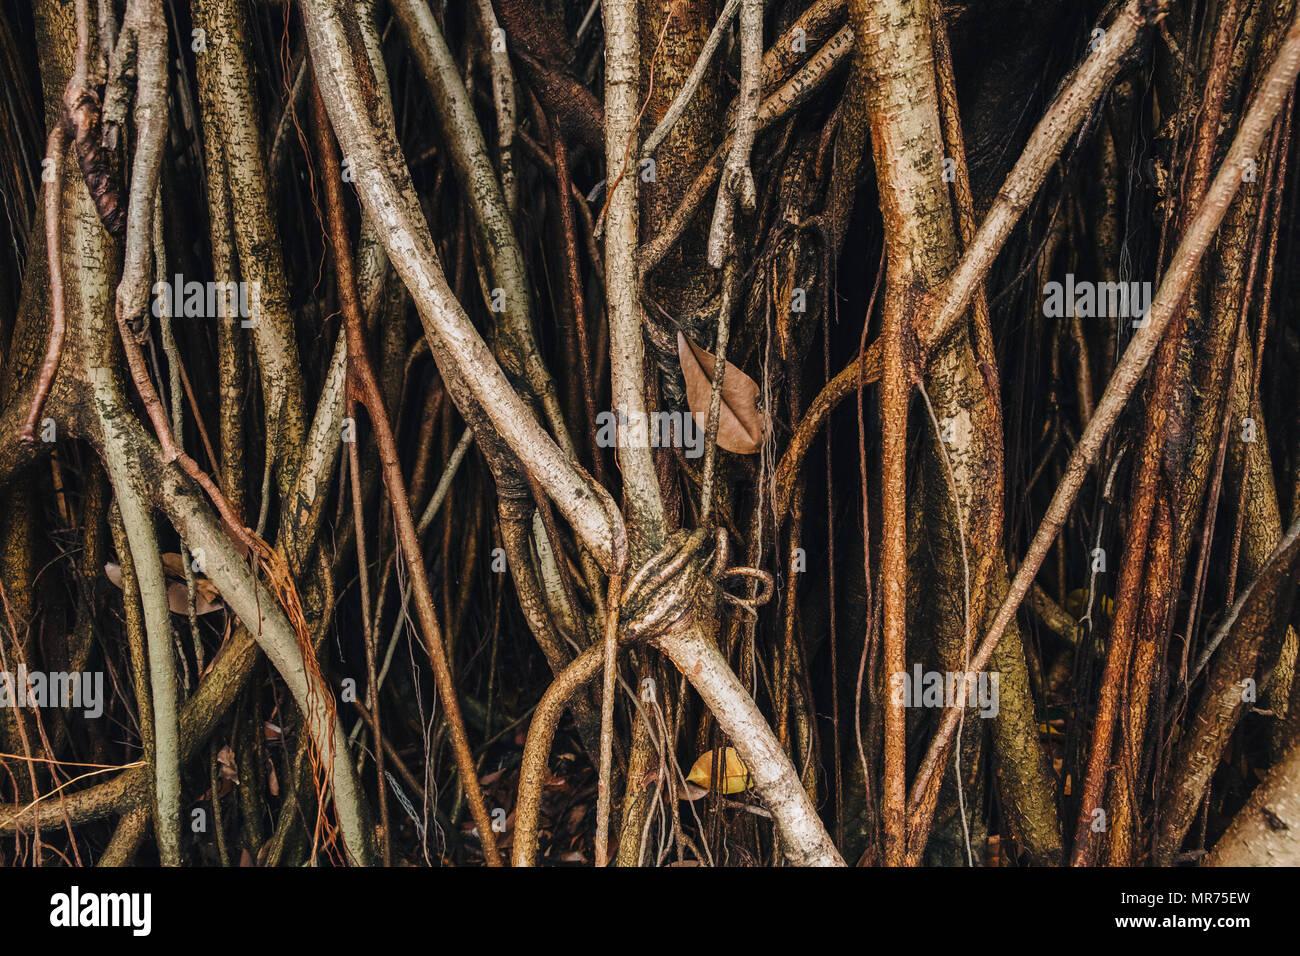 close-up view of beautiful lianas at Kuala Lumpur - Stock Image